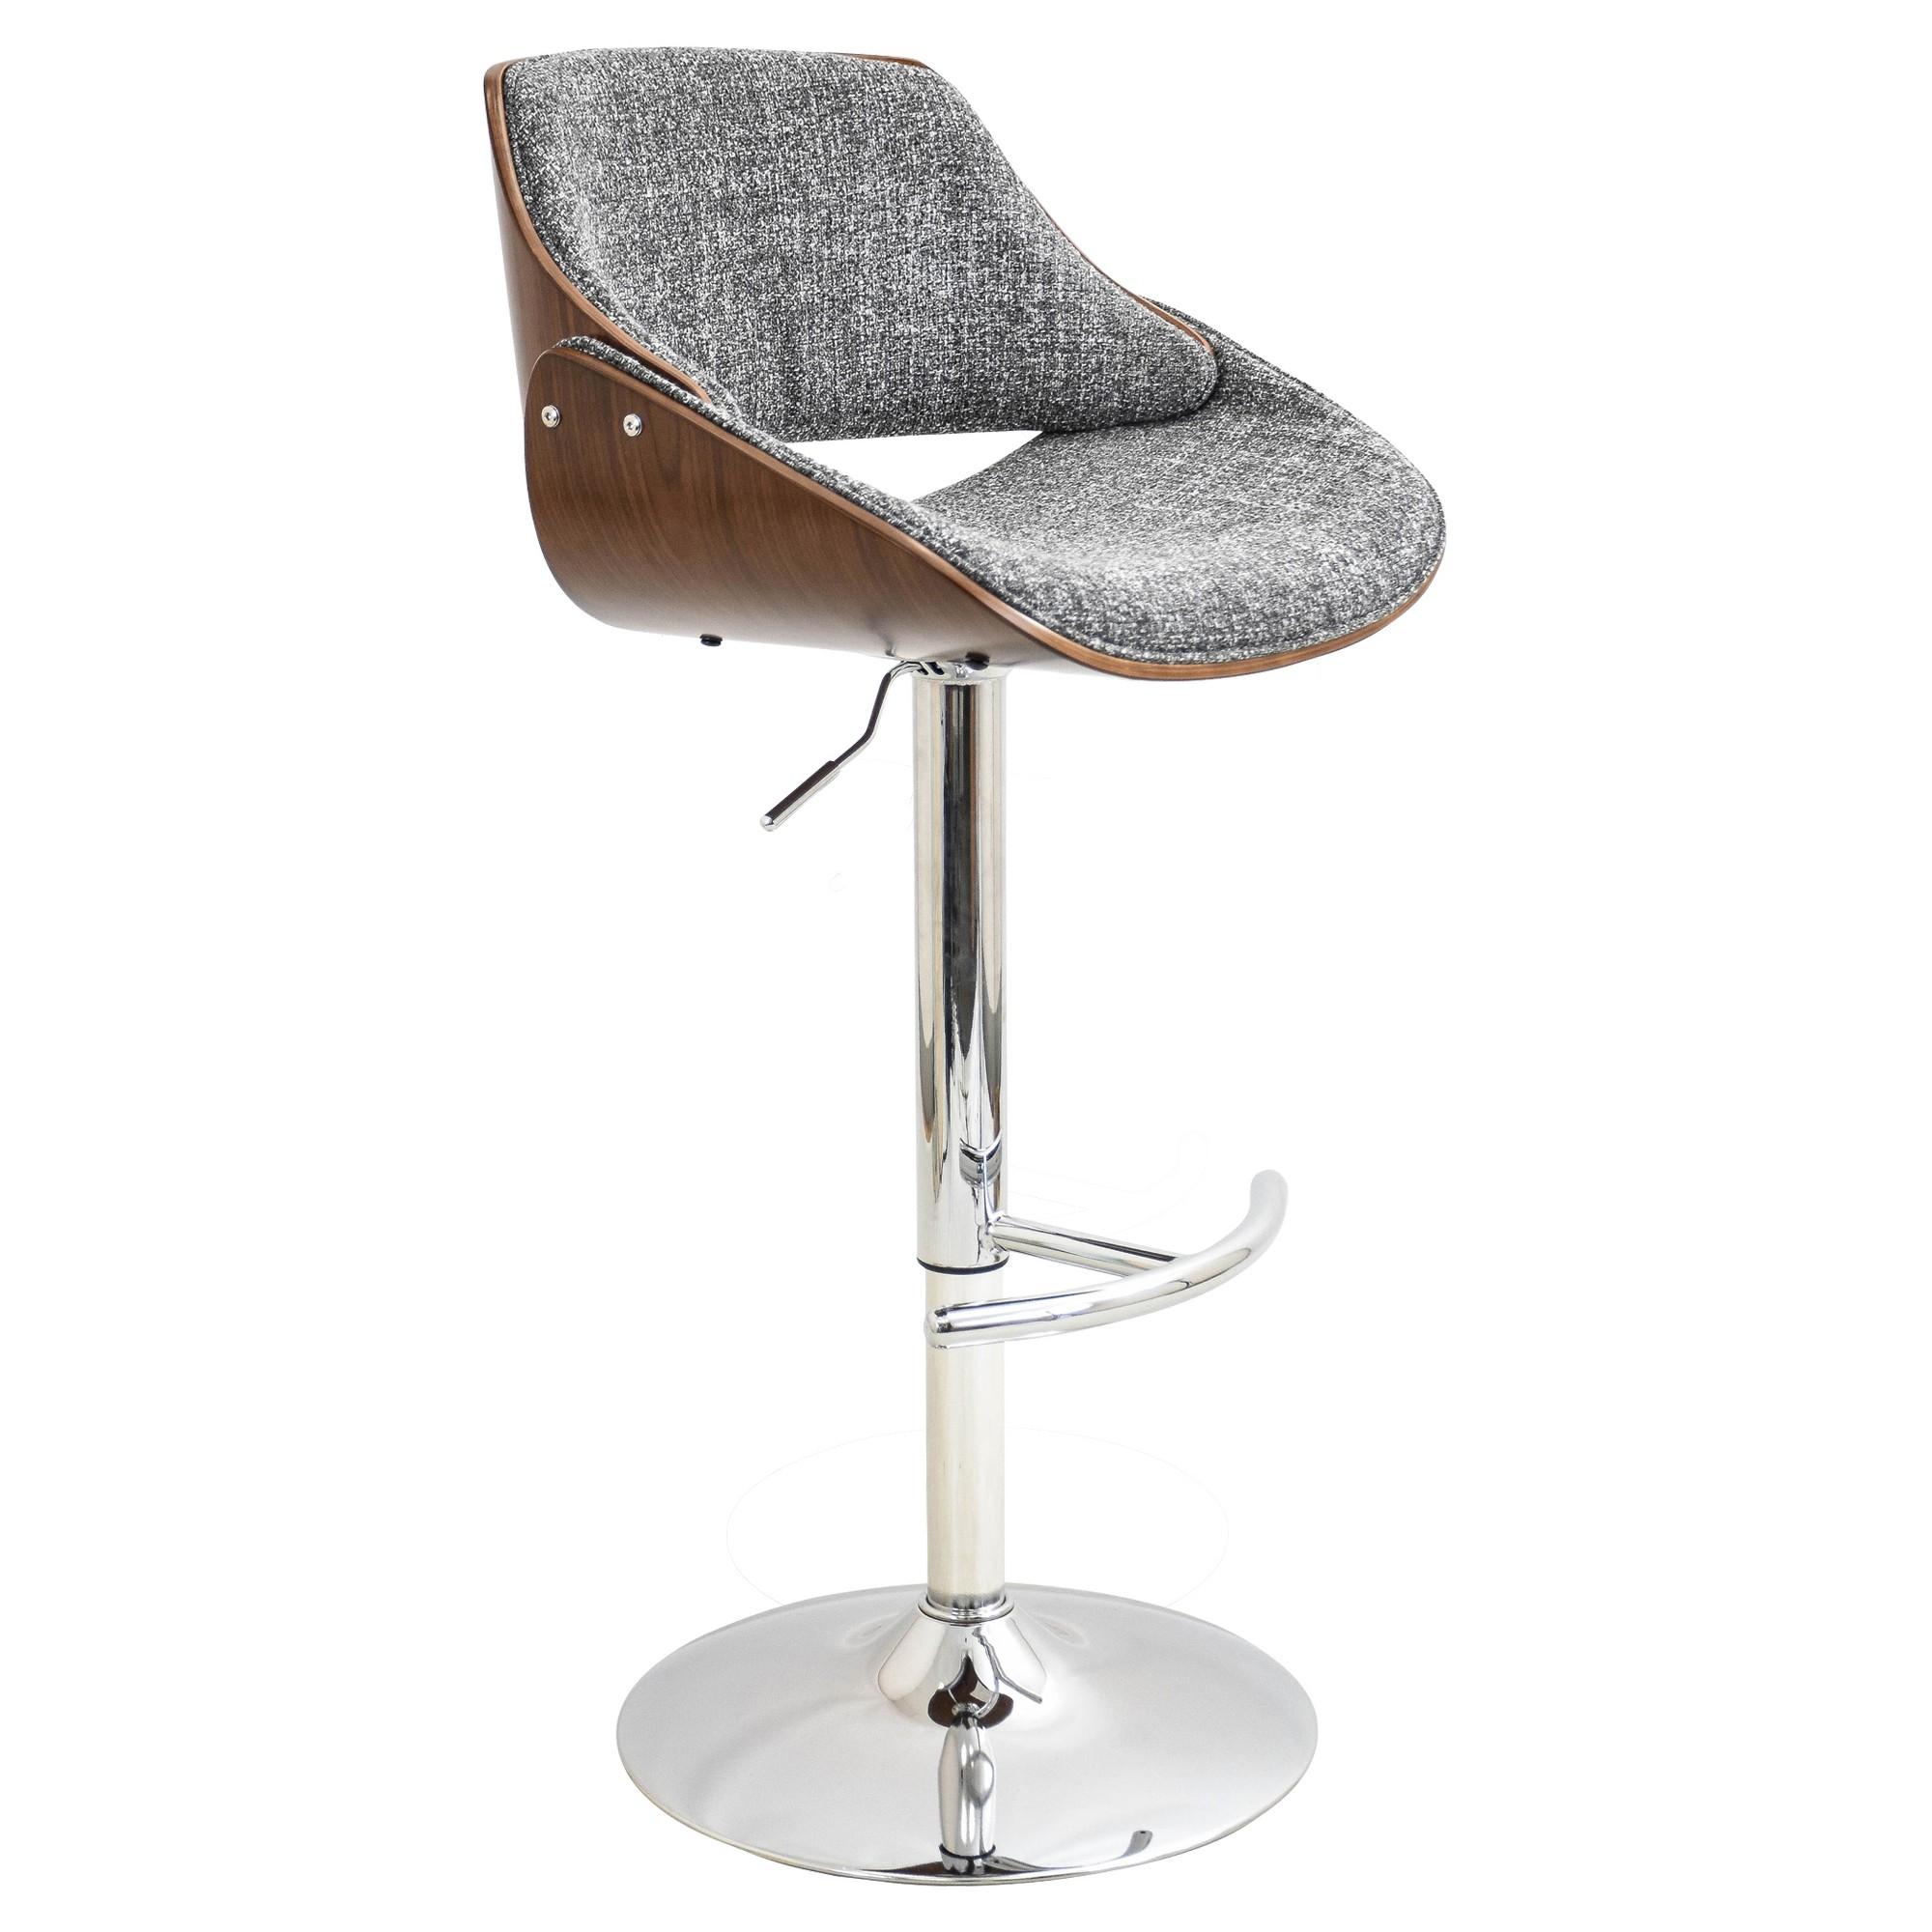 719f1f02d1fb Fabrizi Mid-Century Modern Adjustable Barstool - Gray - LumiSource ...